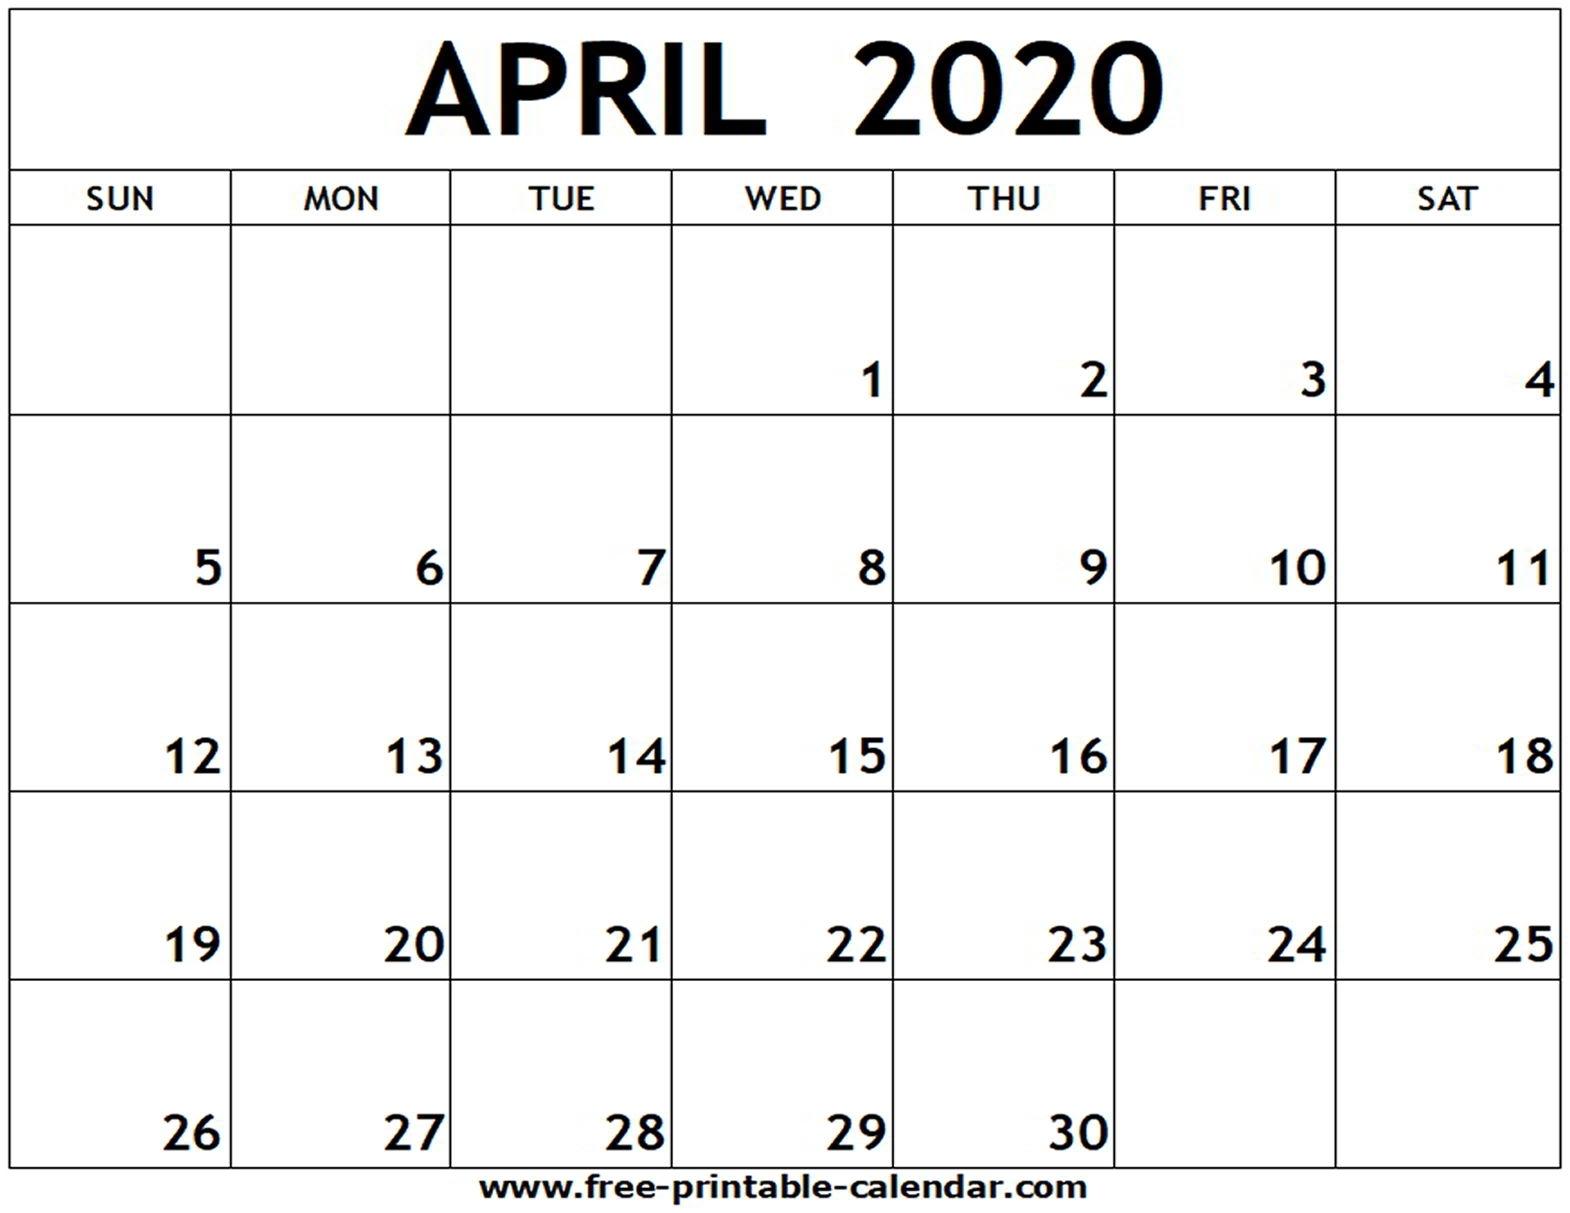 April 2020 Printable Calendar - Free-Printable-Calendar